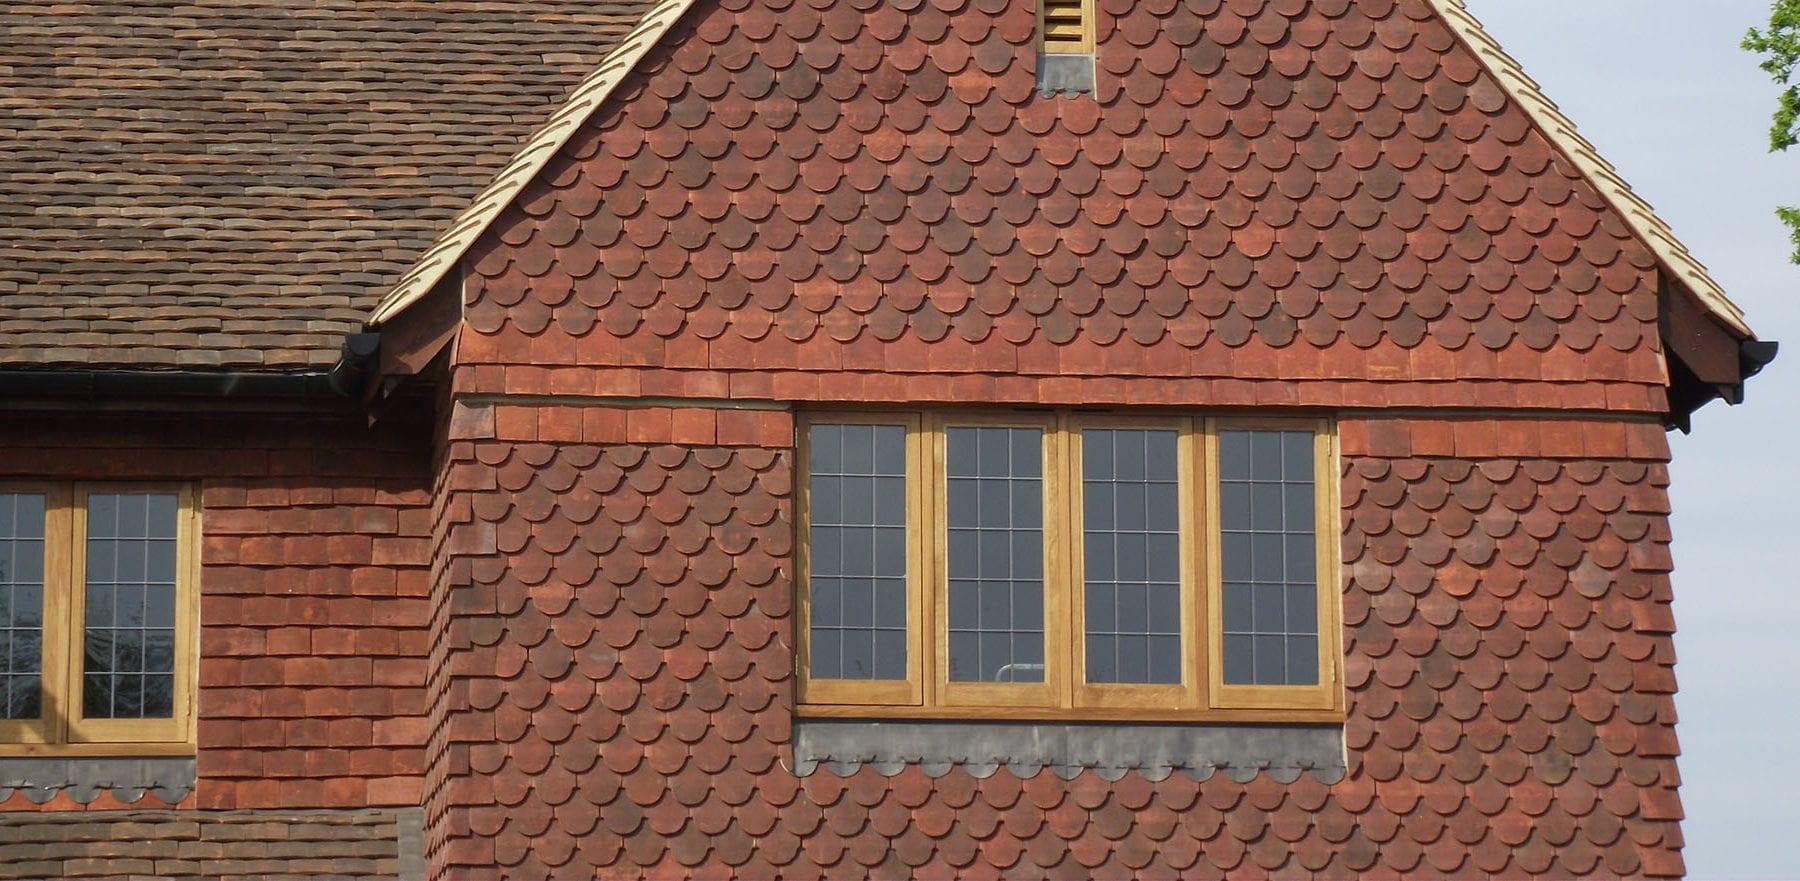 Lifestiles - Handmade Heather Clay Roof Tiles - Surrey, England 2